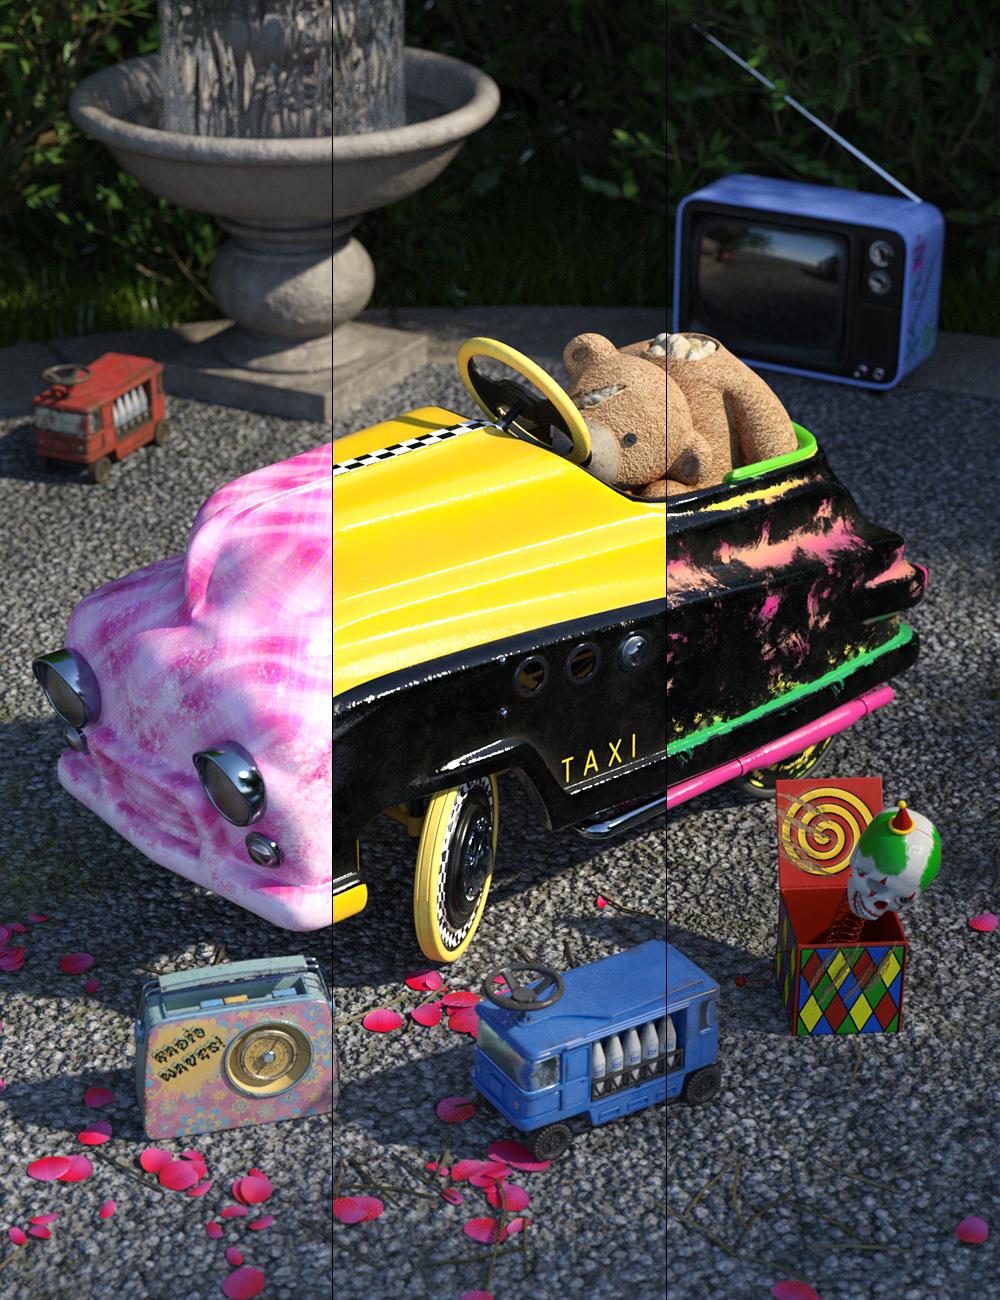 Vintage Toy Car by: ForbiddenWhispersDavid Brinnen, 3D Models by Daz 3D